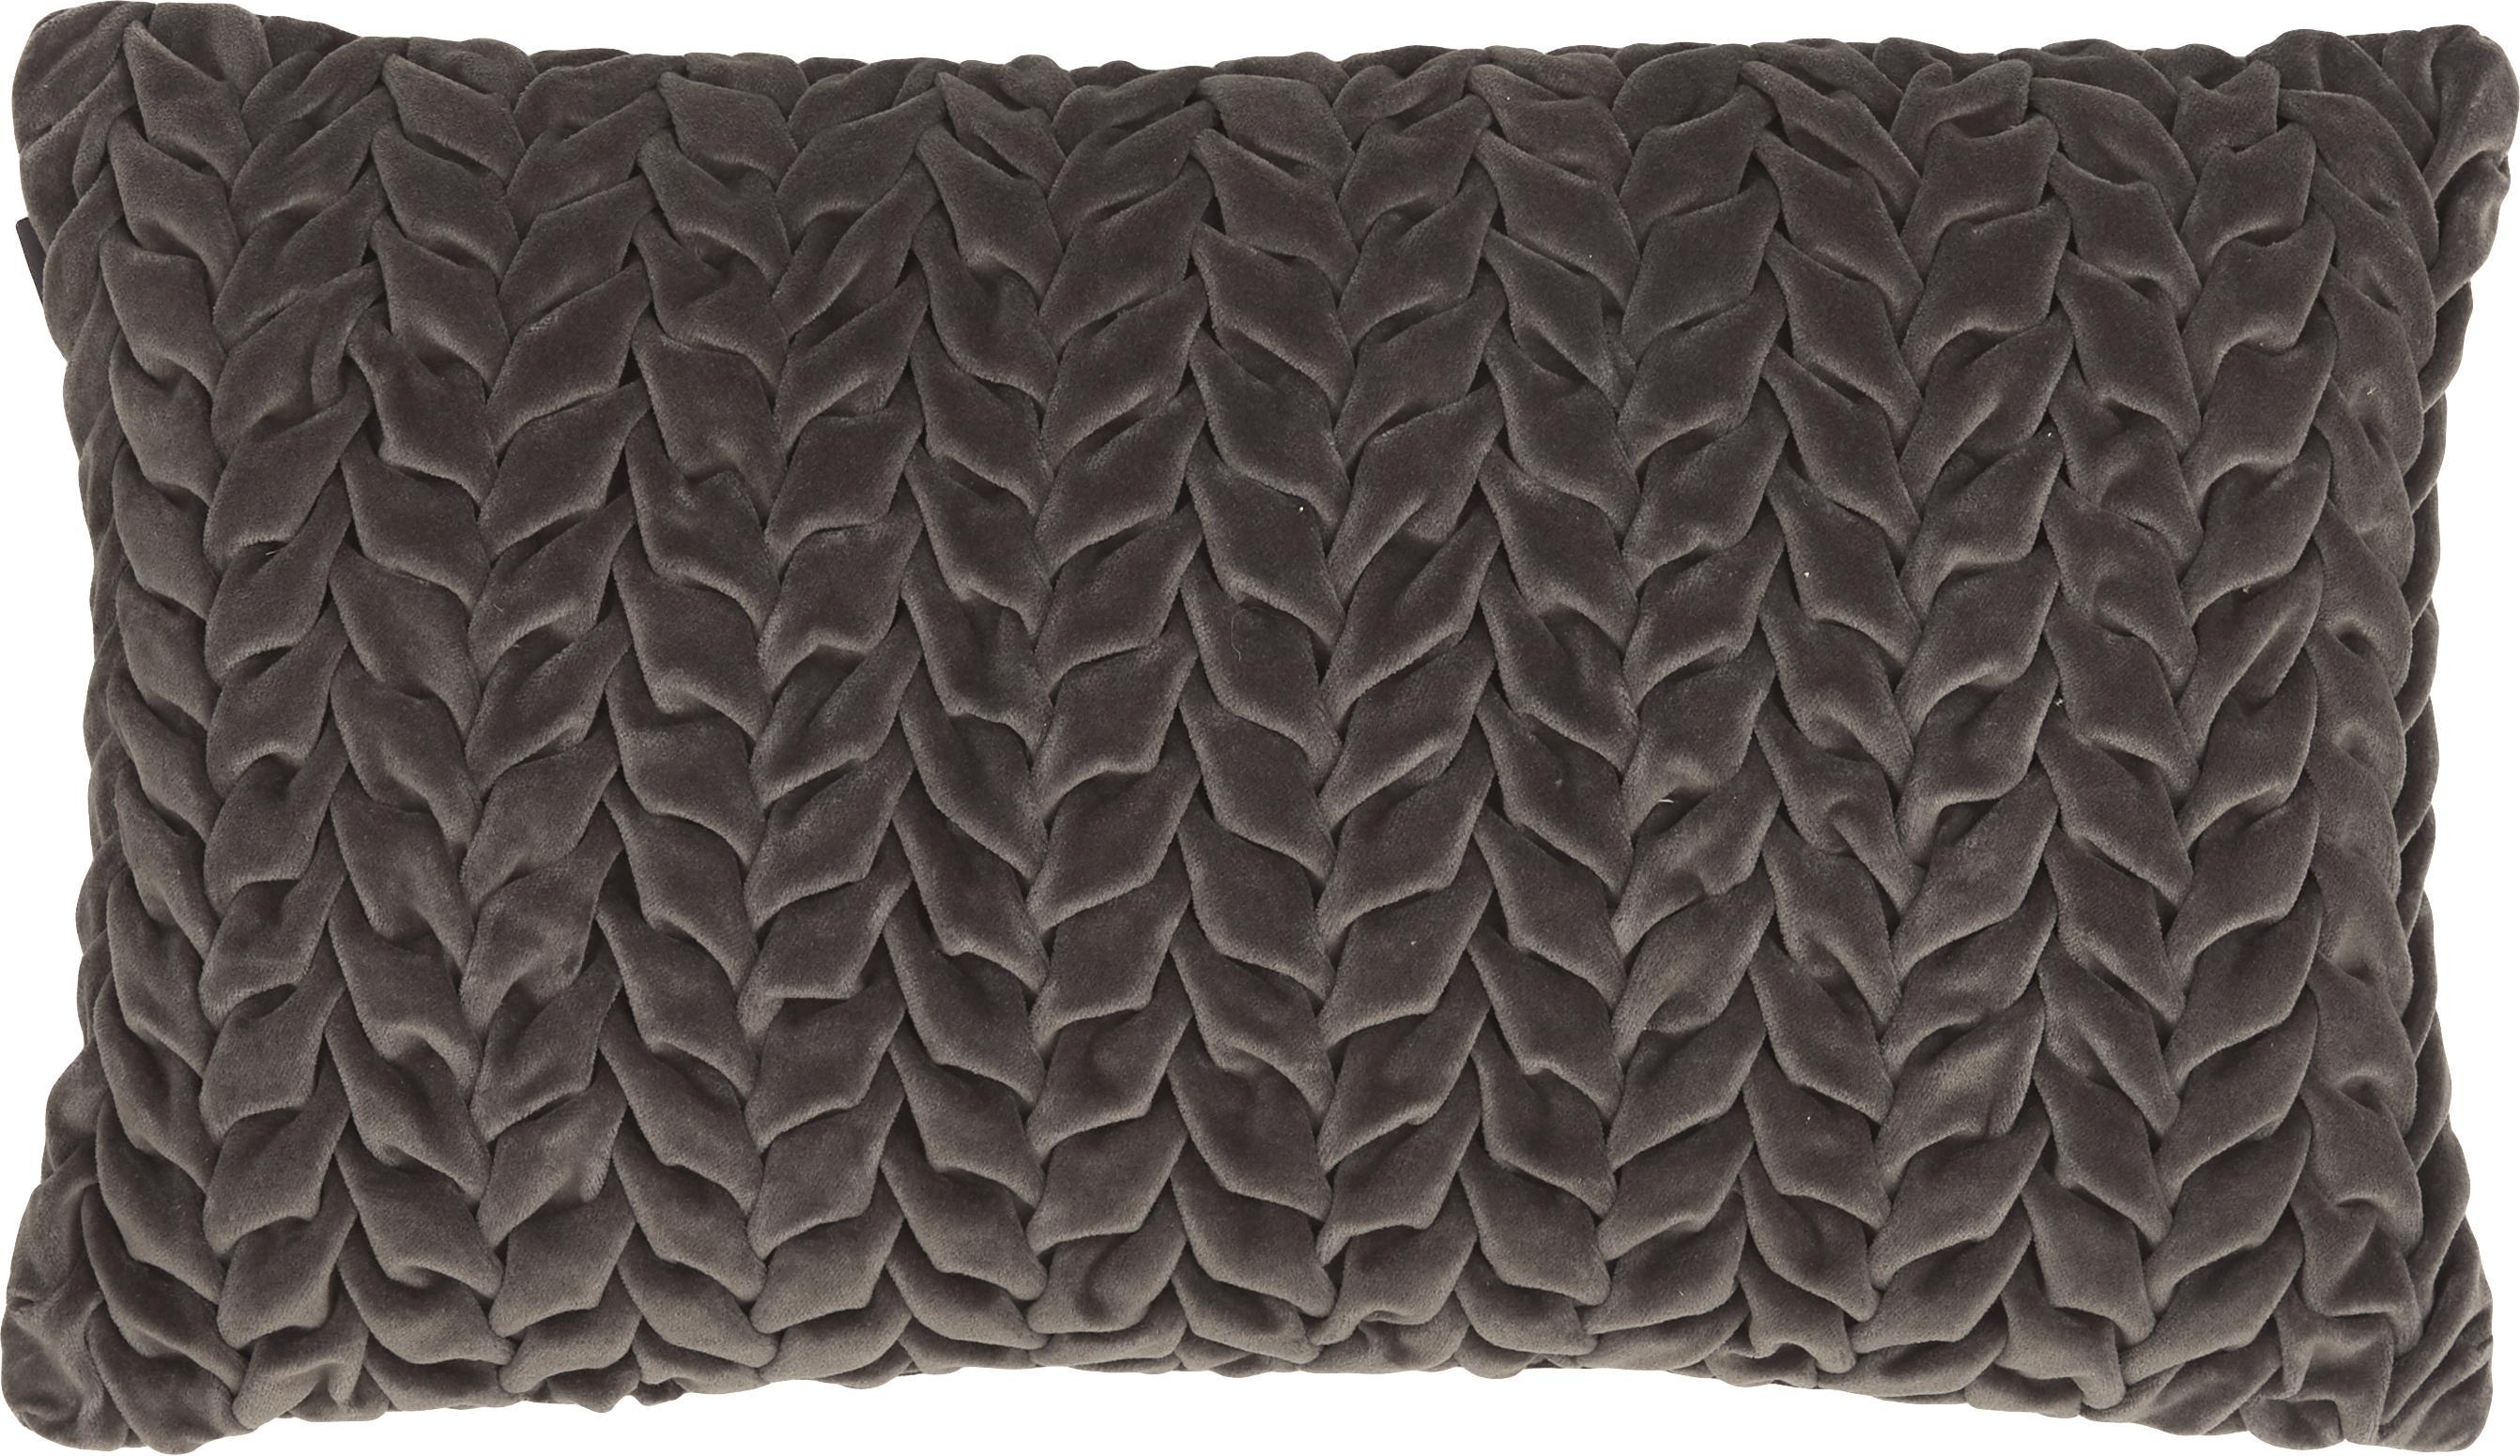 Cojín de terciopeloSmock, con relleno, Funda: 100%terciopelo de algodó, Gris, An 30 x L 50 cm